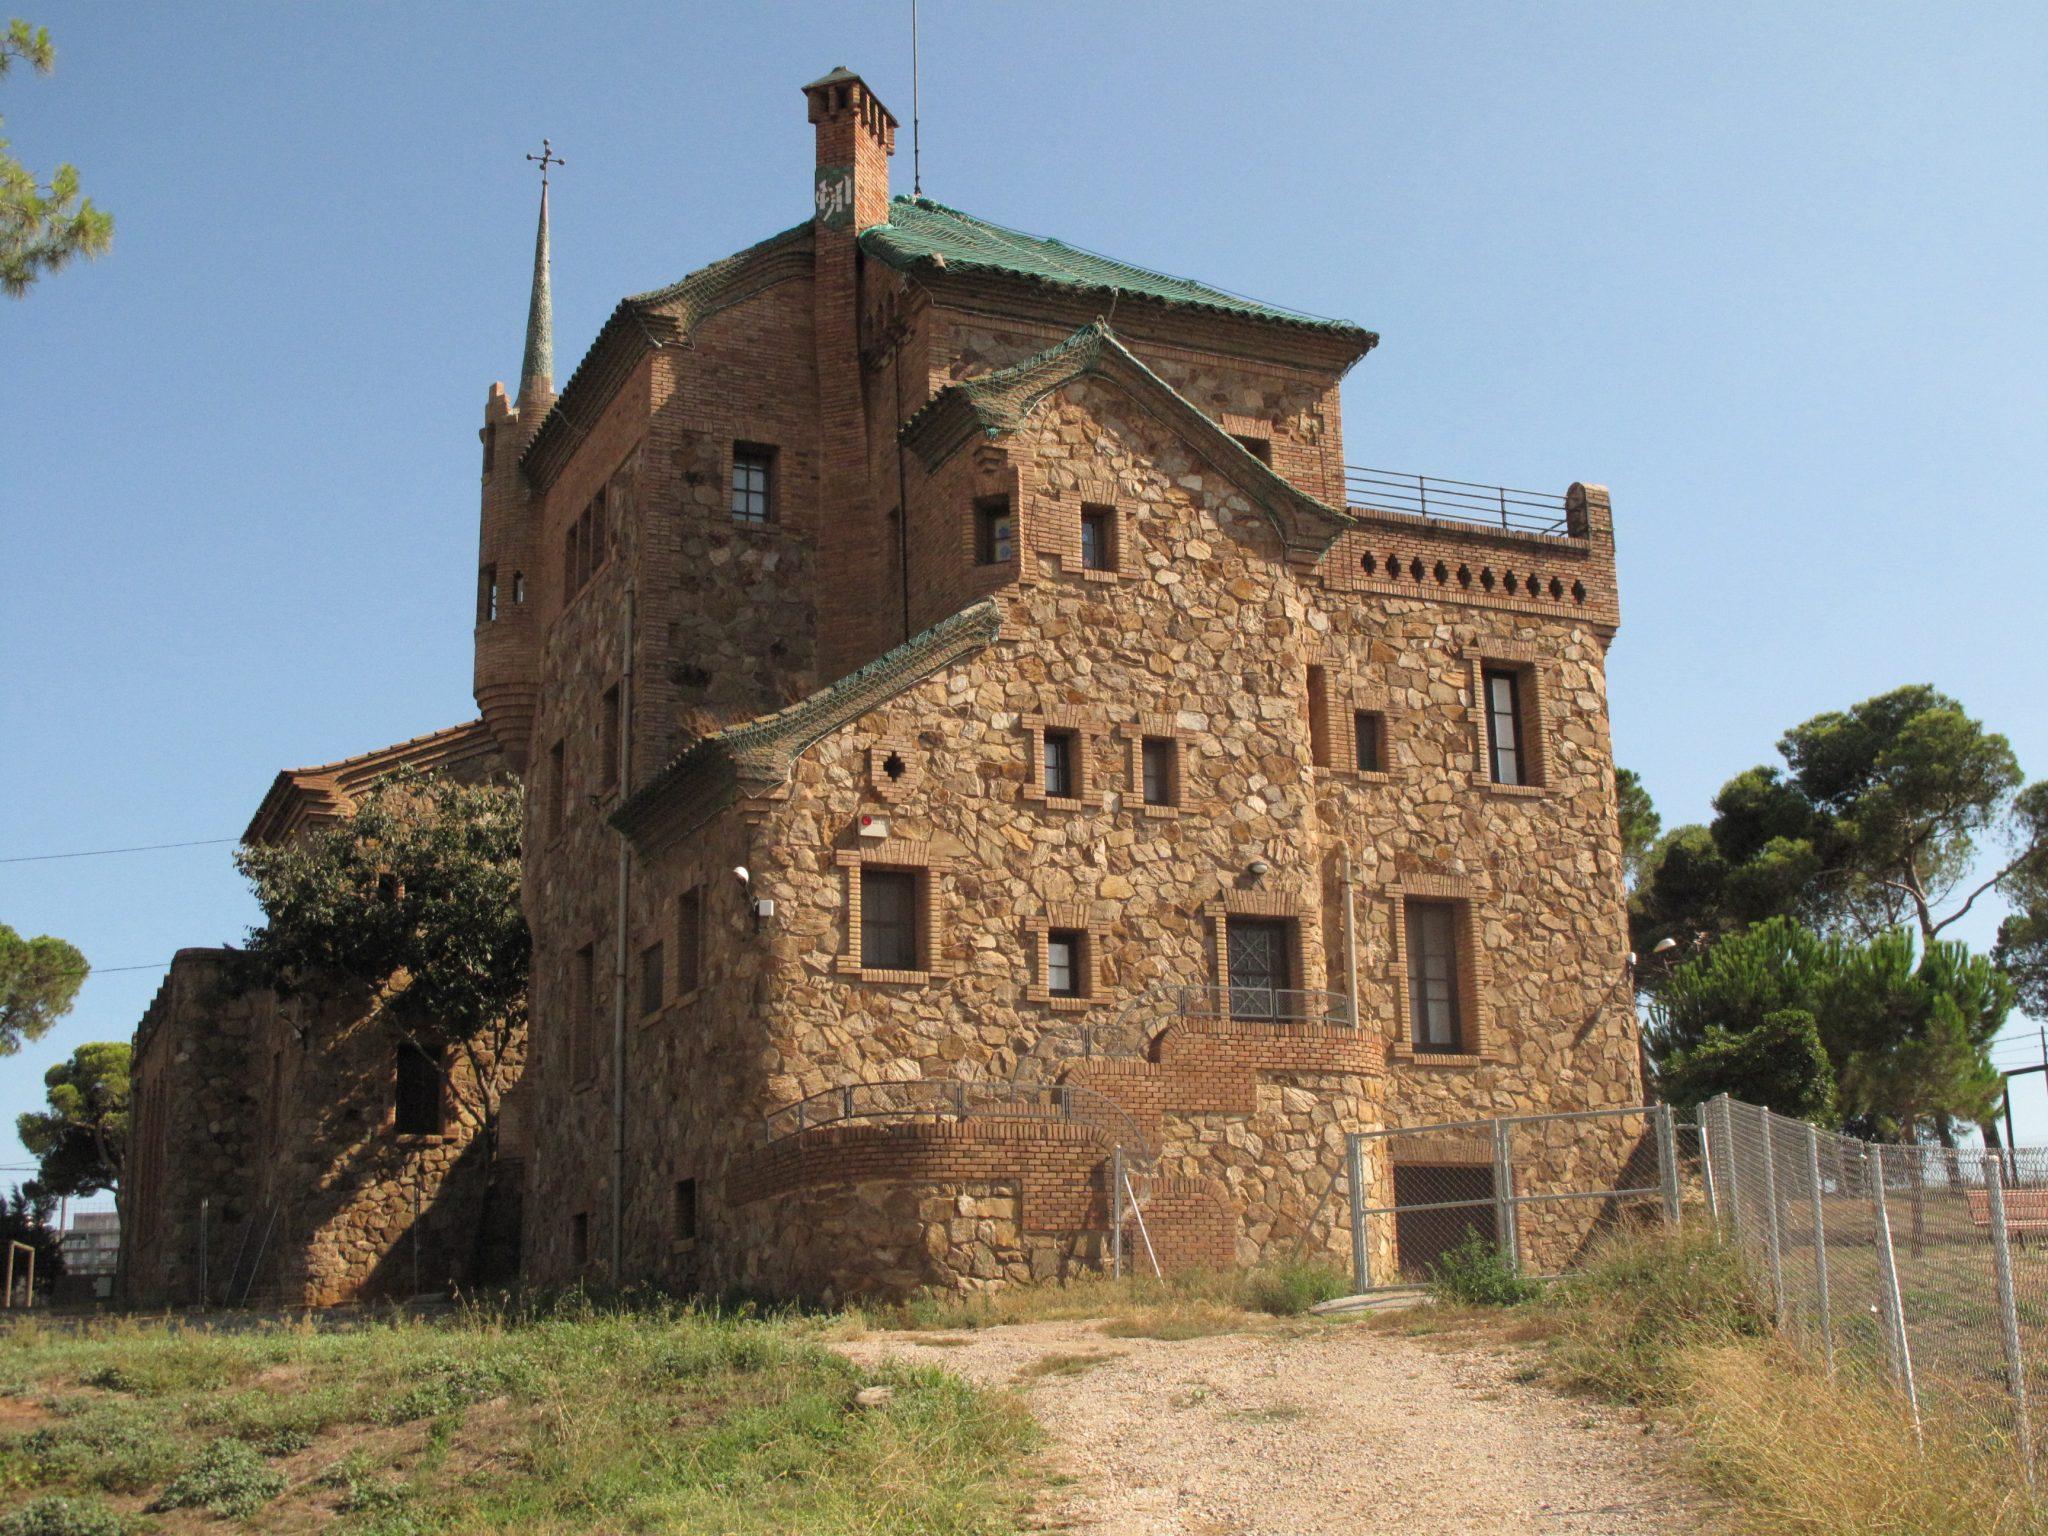 La colonia g ell shbarcelona diario de viaje barcelona - Idea casa biancheria mestre ...